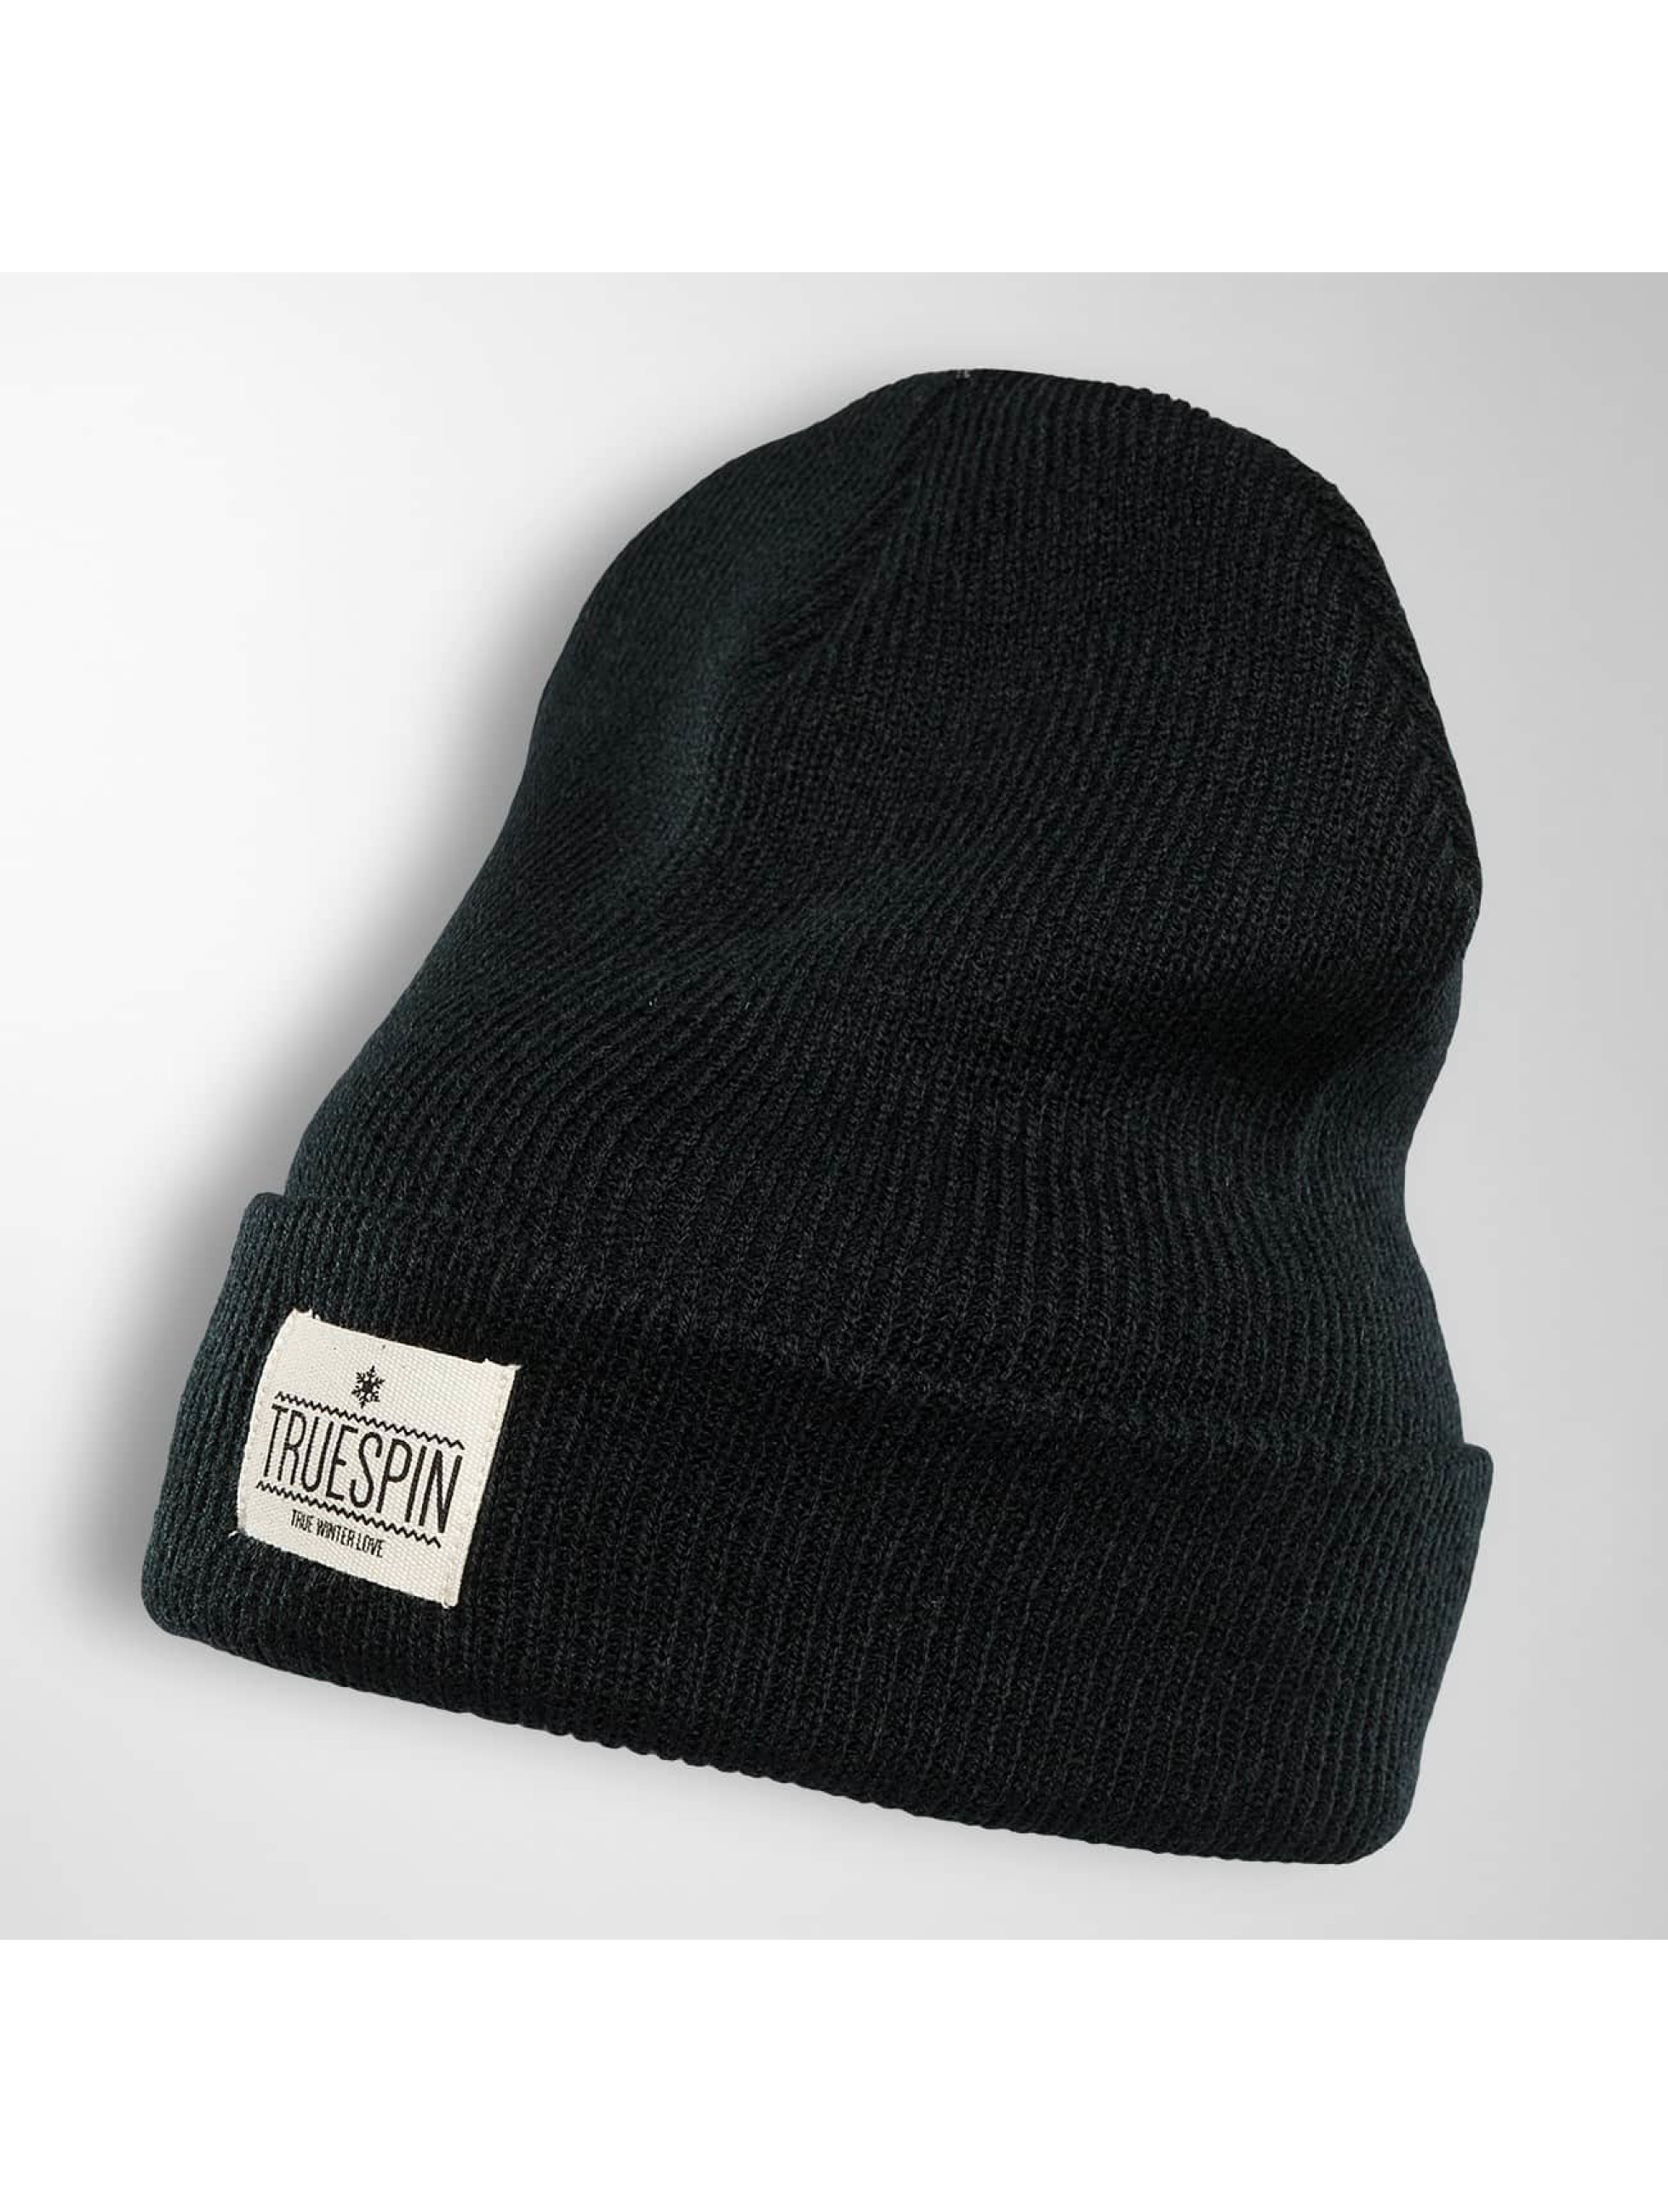 TrueSpin Beanie Warm black